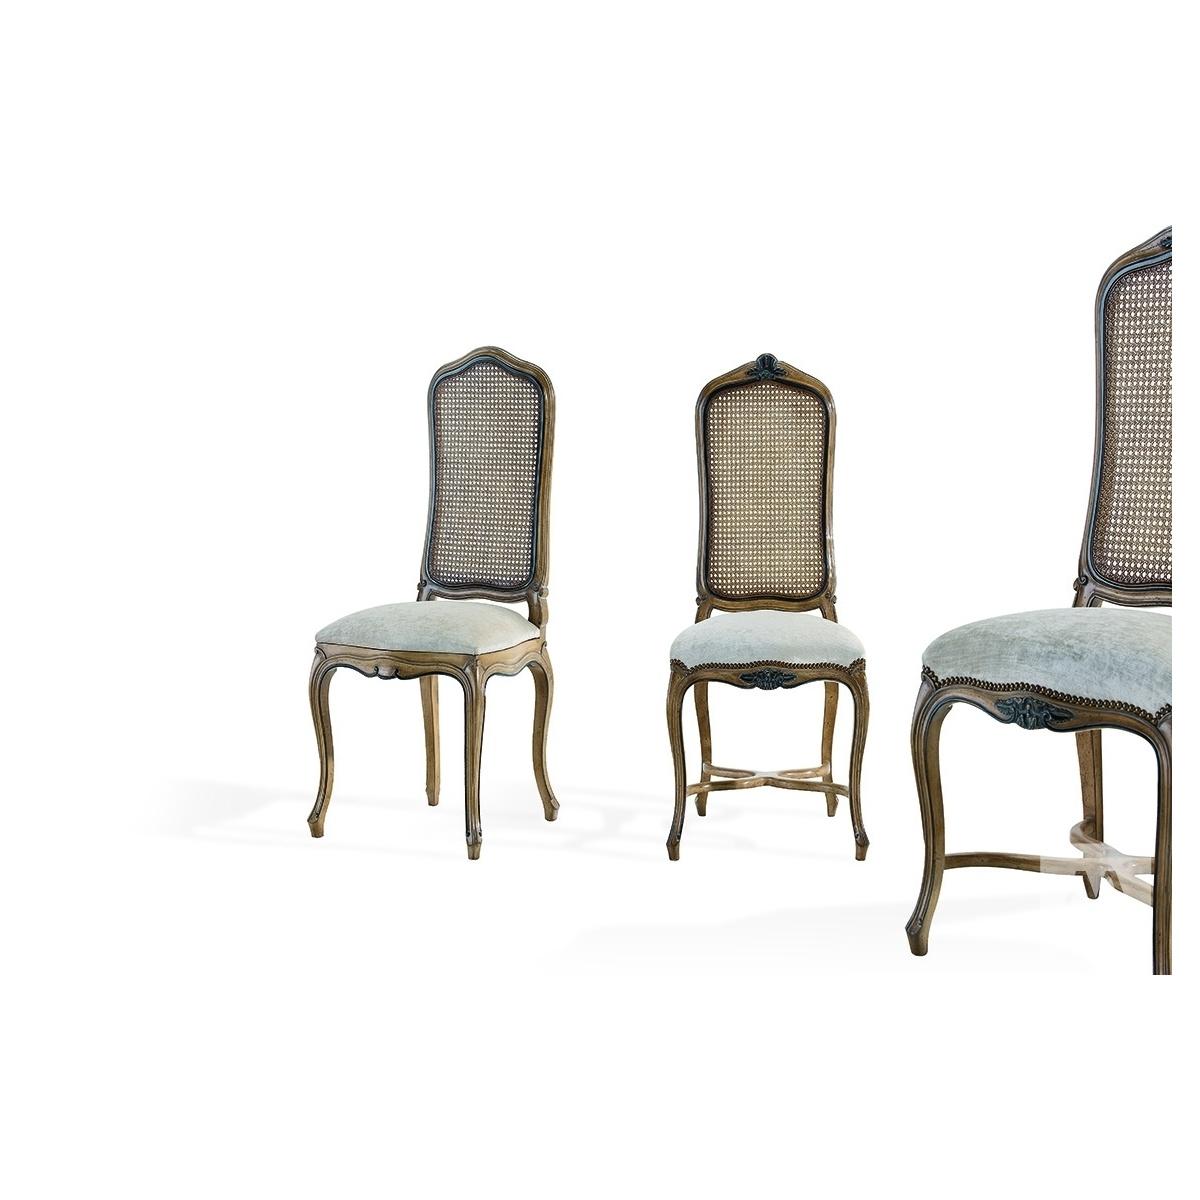 Swanky Furniture Especial Swanky Furniture Itrockstarsco